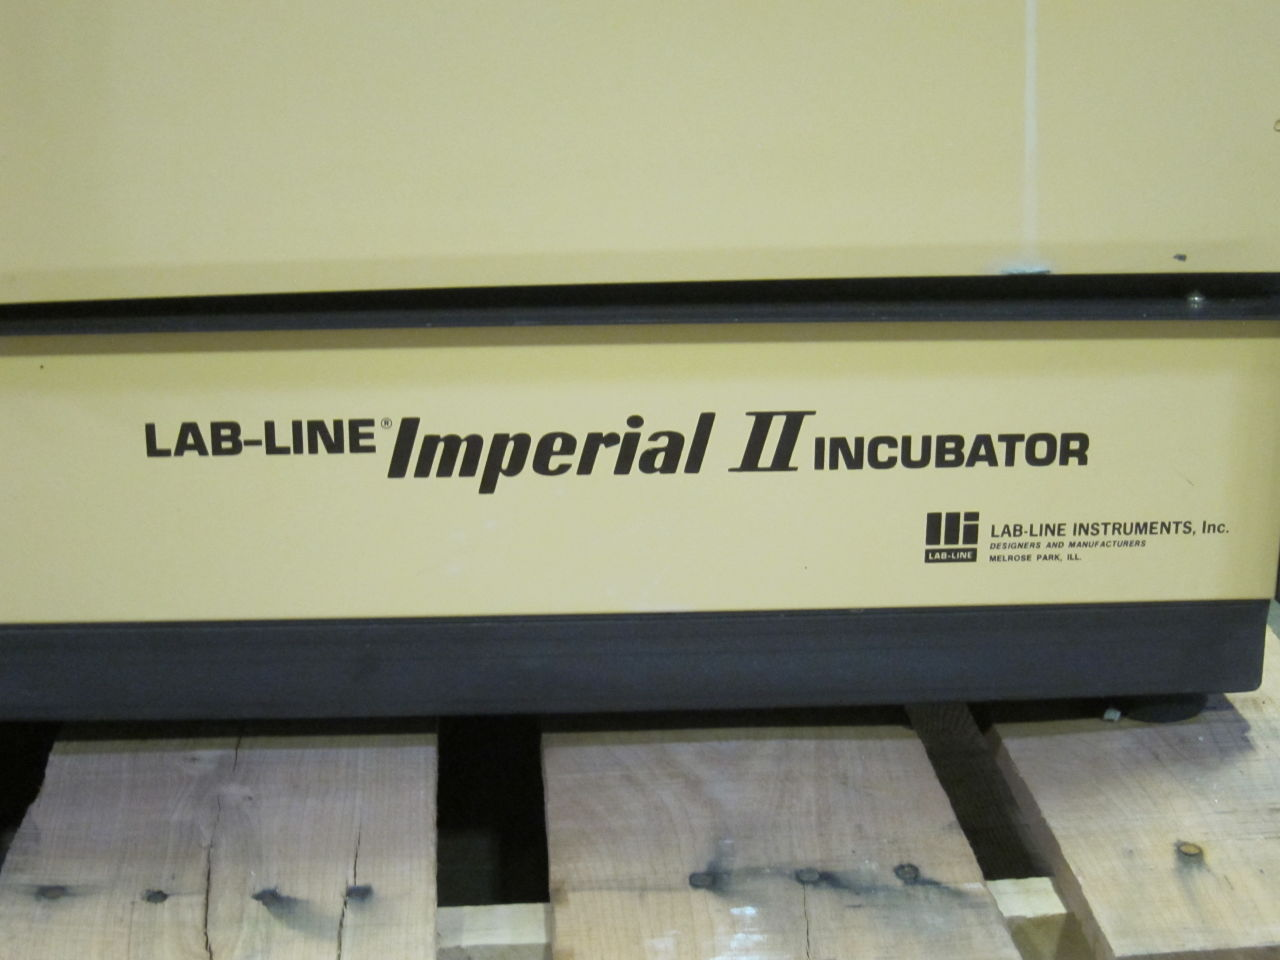 LAB-LINE Imperial II Incubator